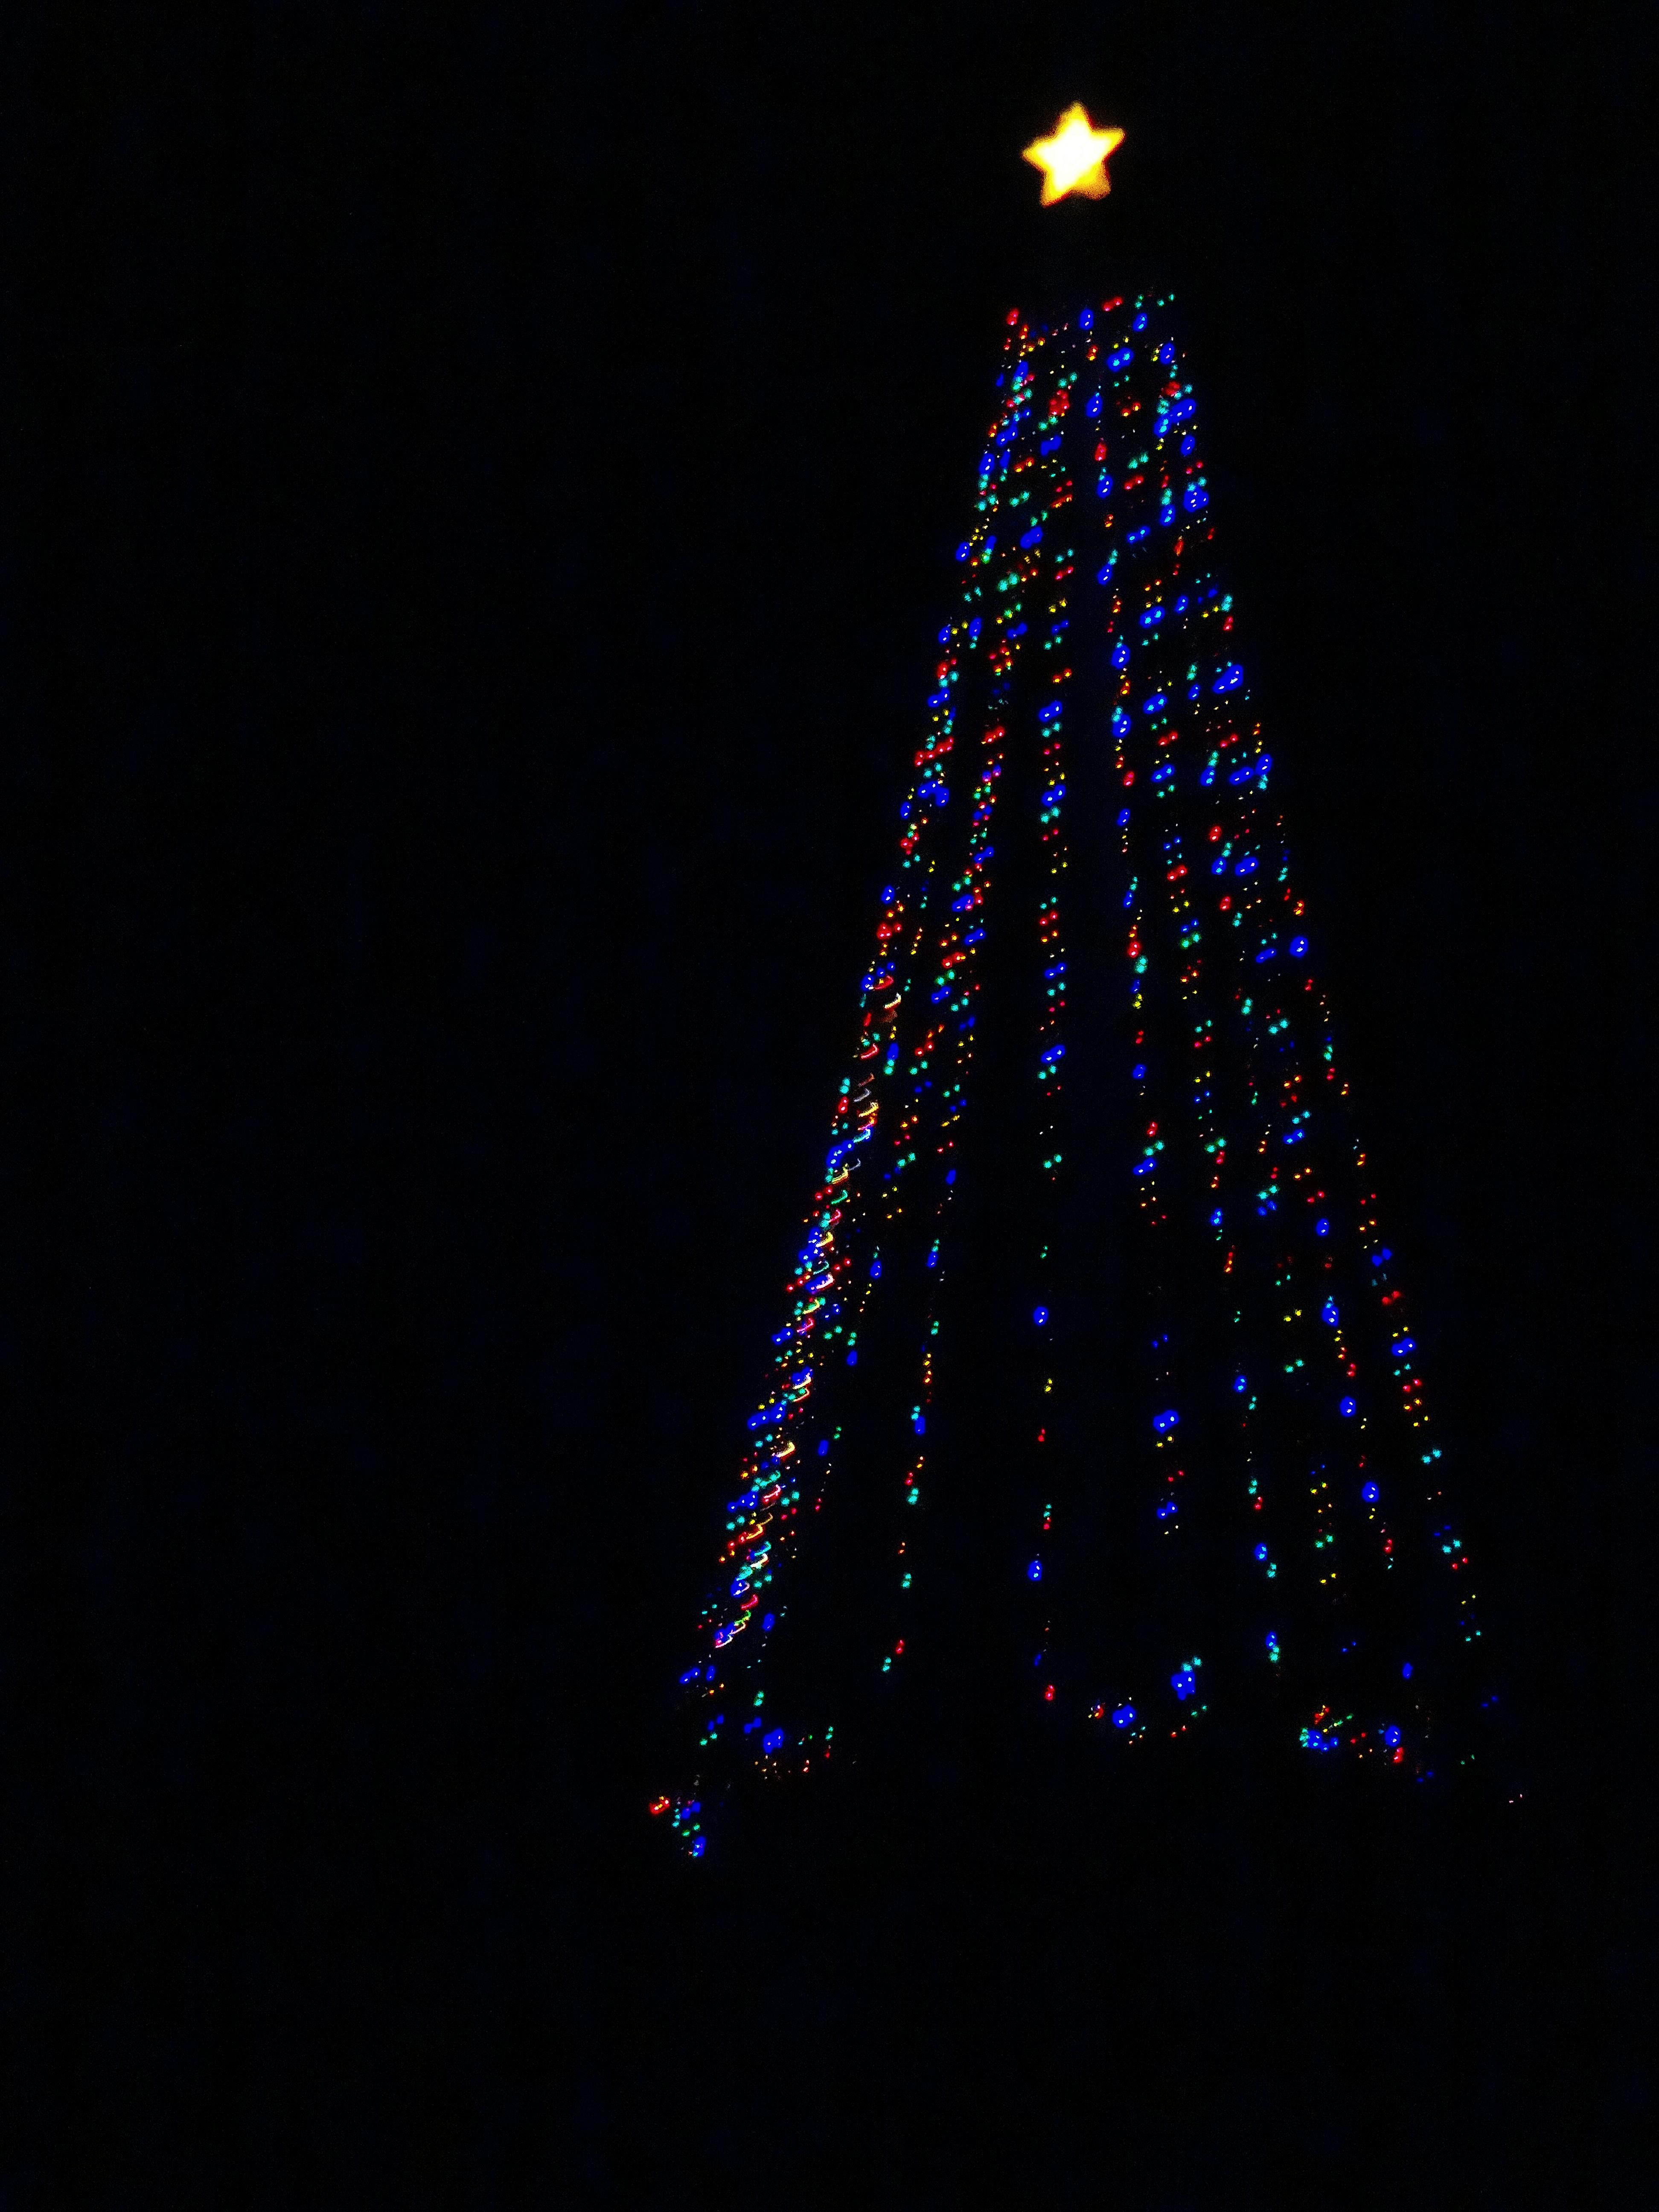 filecross plains hilltop christmas tree panoramio 2jpg - Hilltop Christmas